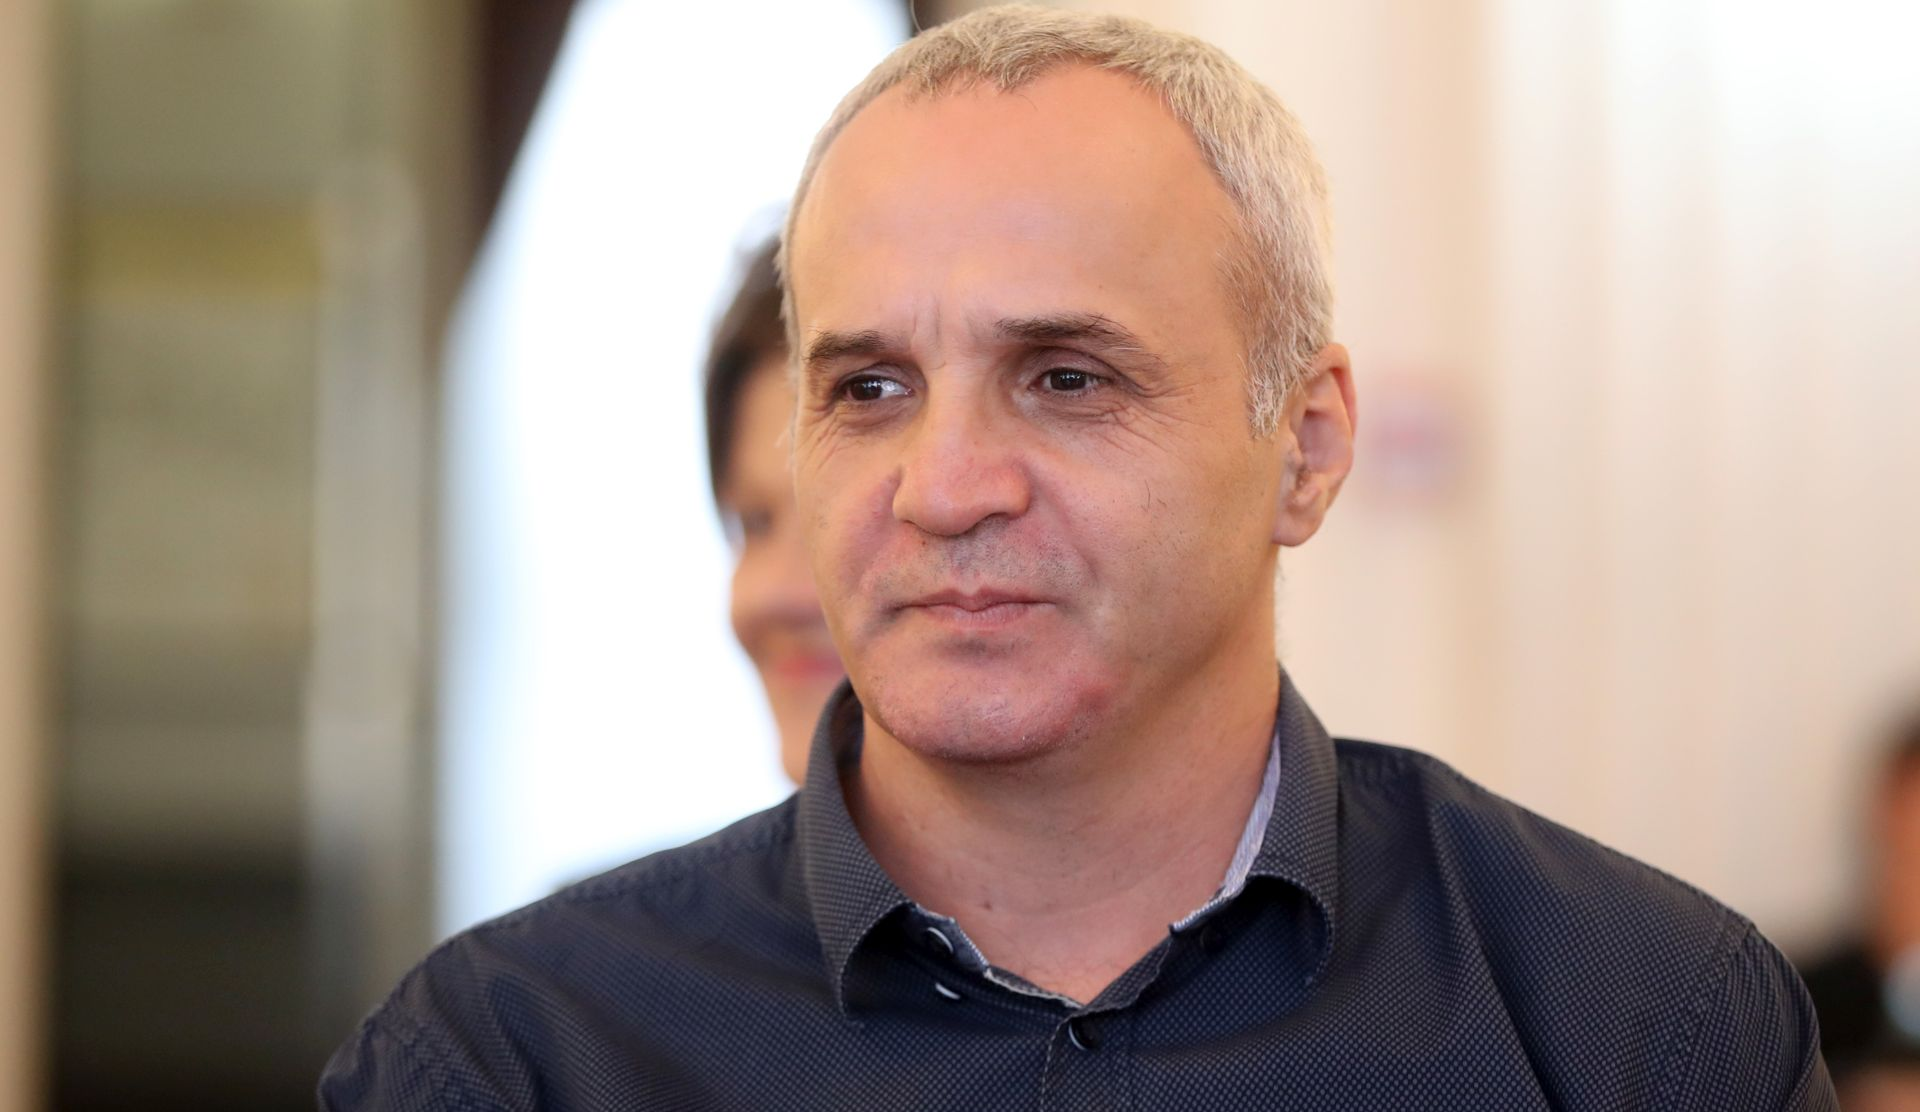 HRT dao otkaz Zovku, pozivaju se na Istanbulsku konvenciju